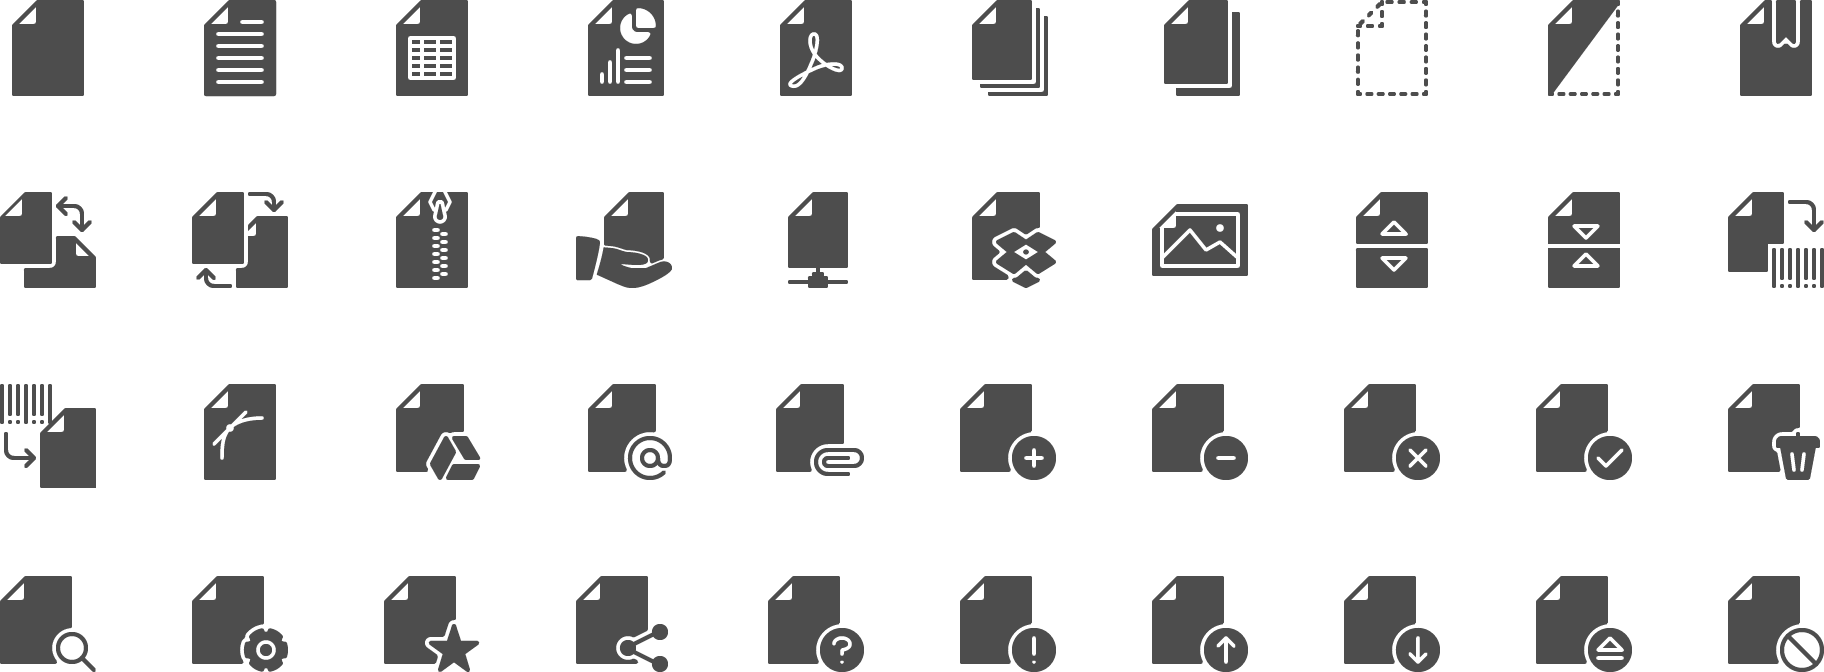 icon Files